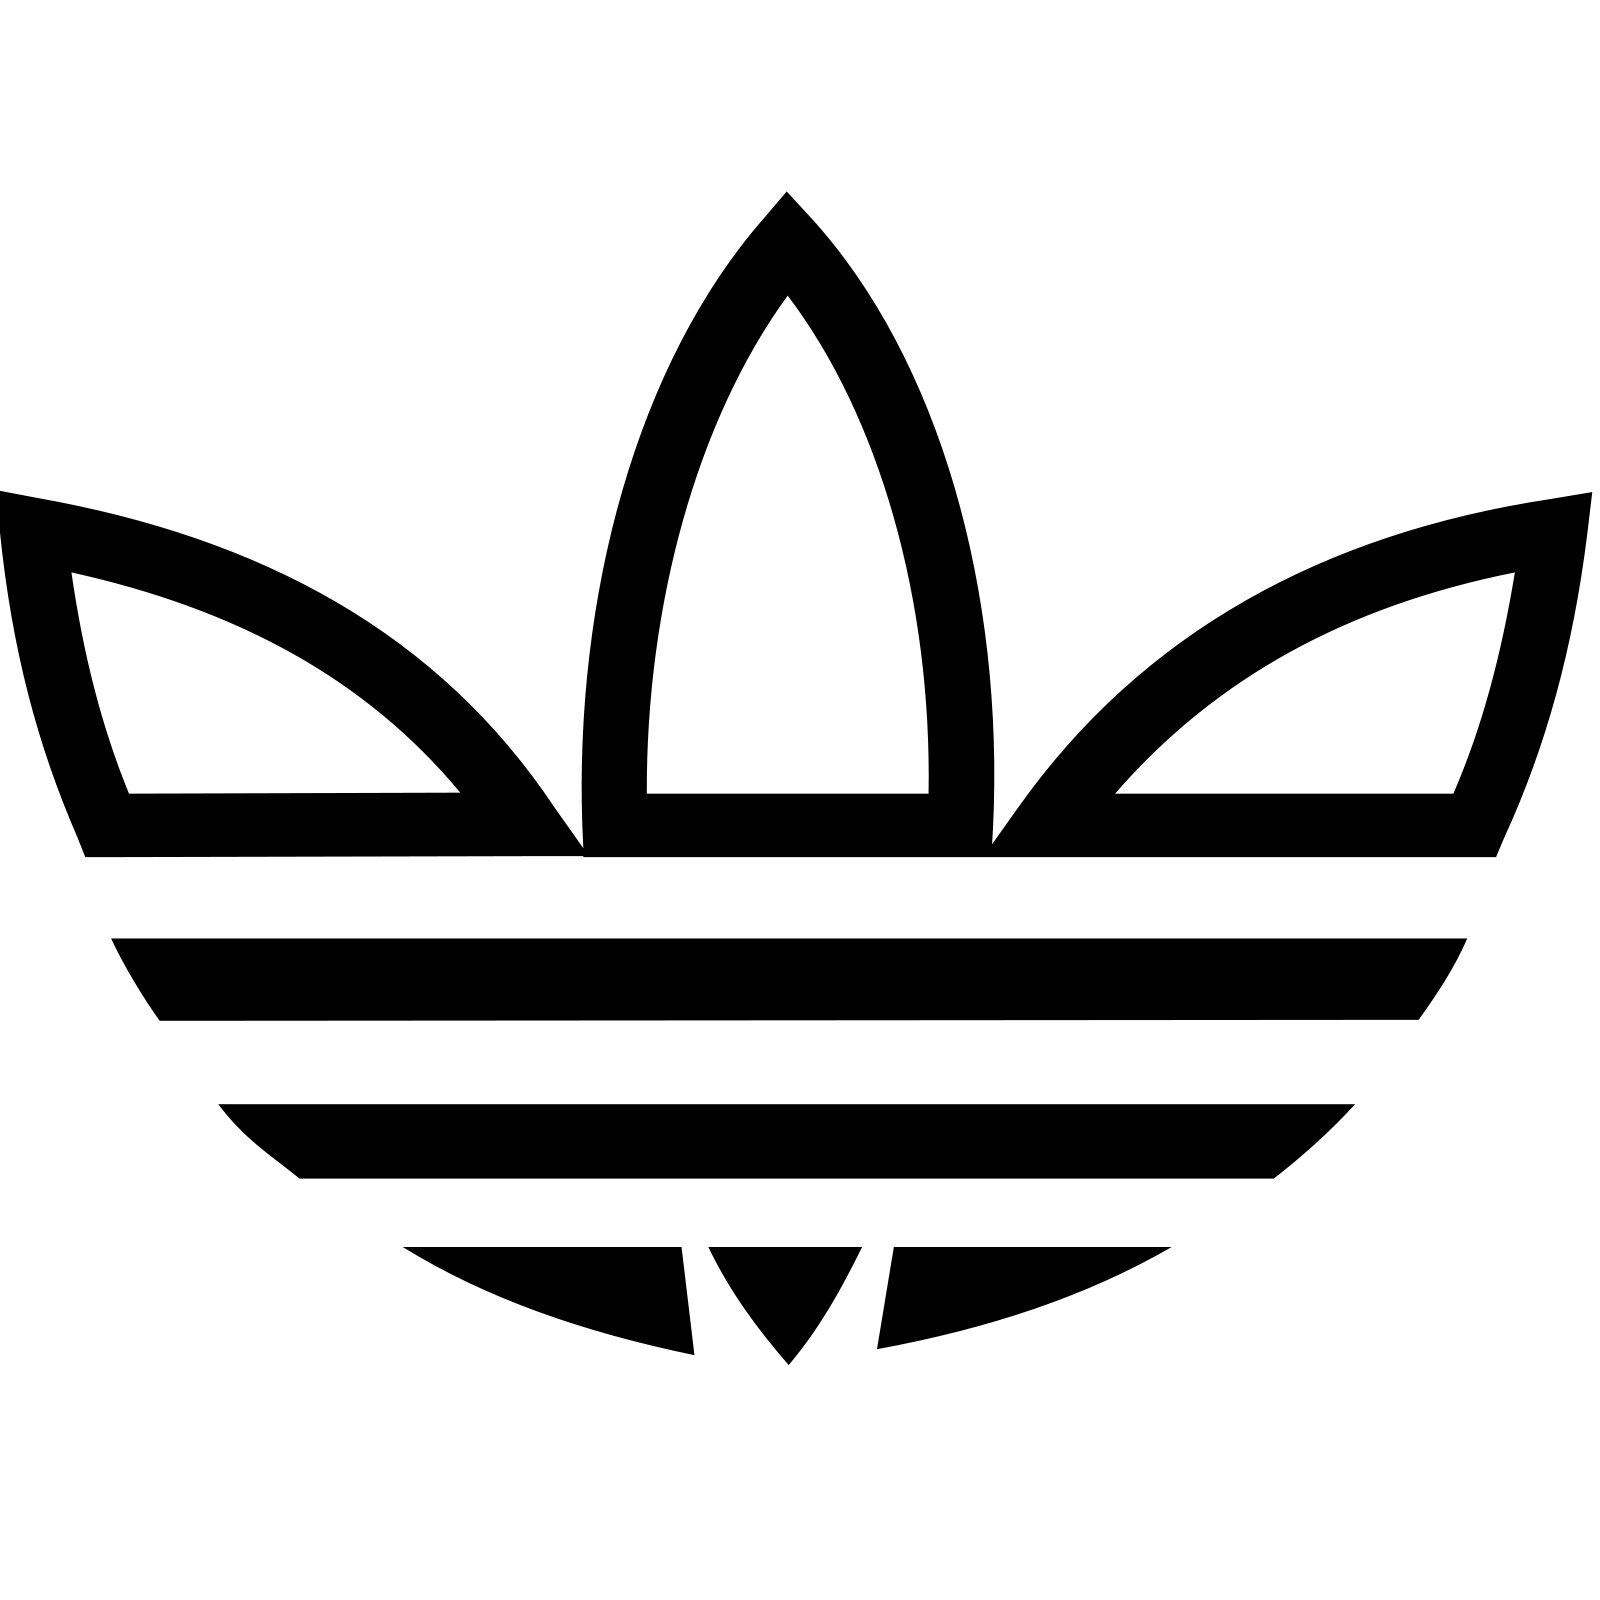 Adidas Trefoil icon - Adidas Trefoil PNG